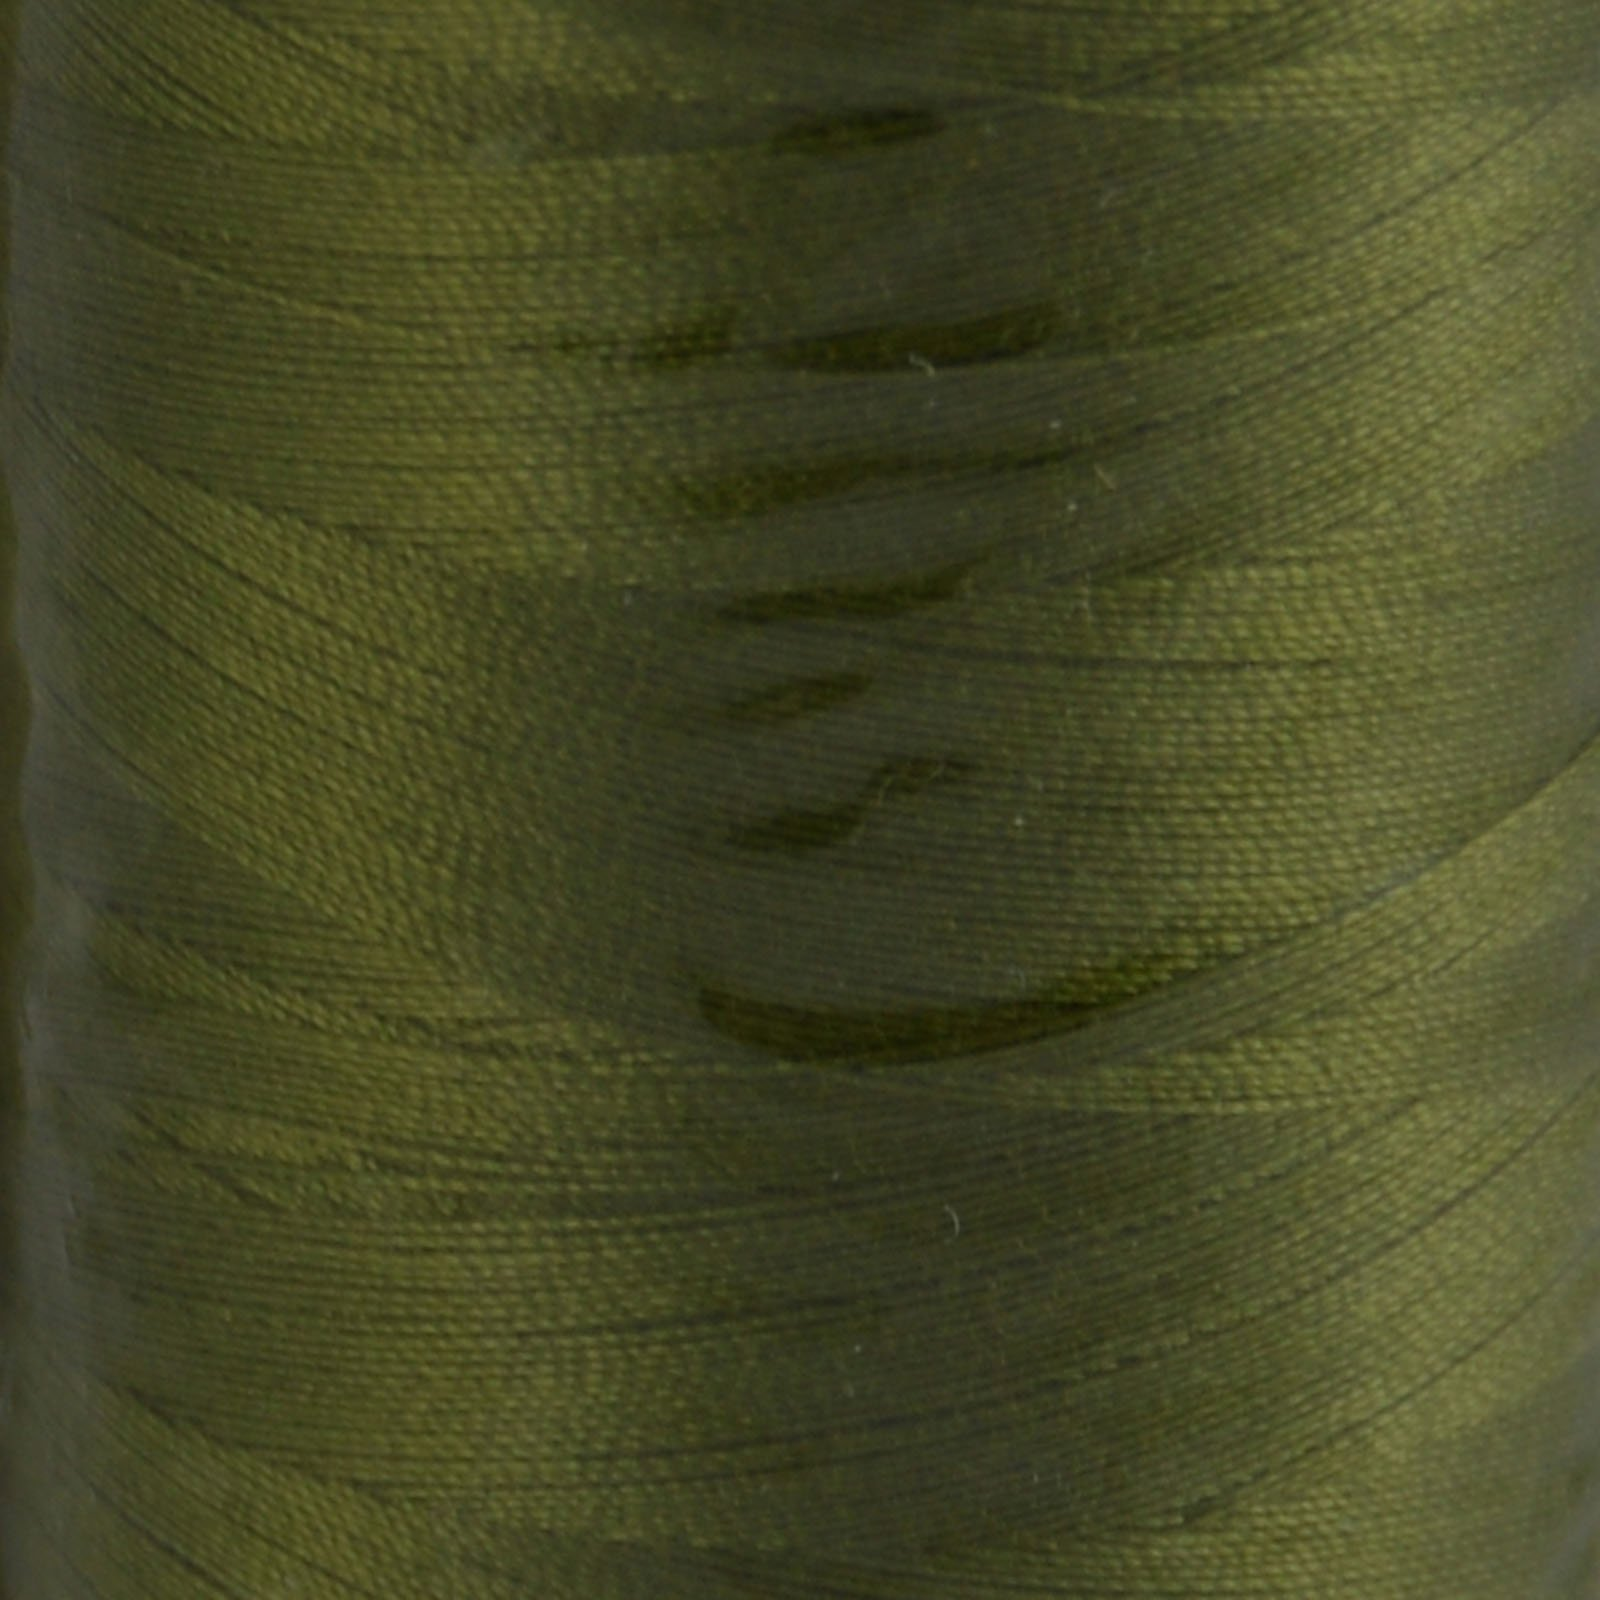 # 2887 Very Dark Olive